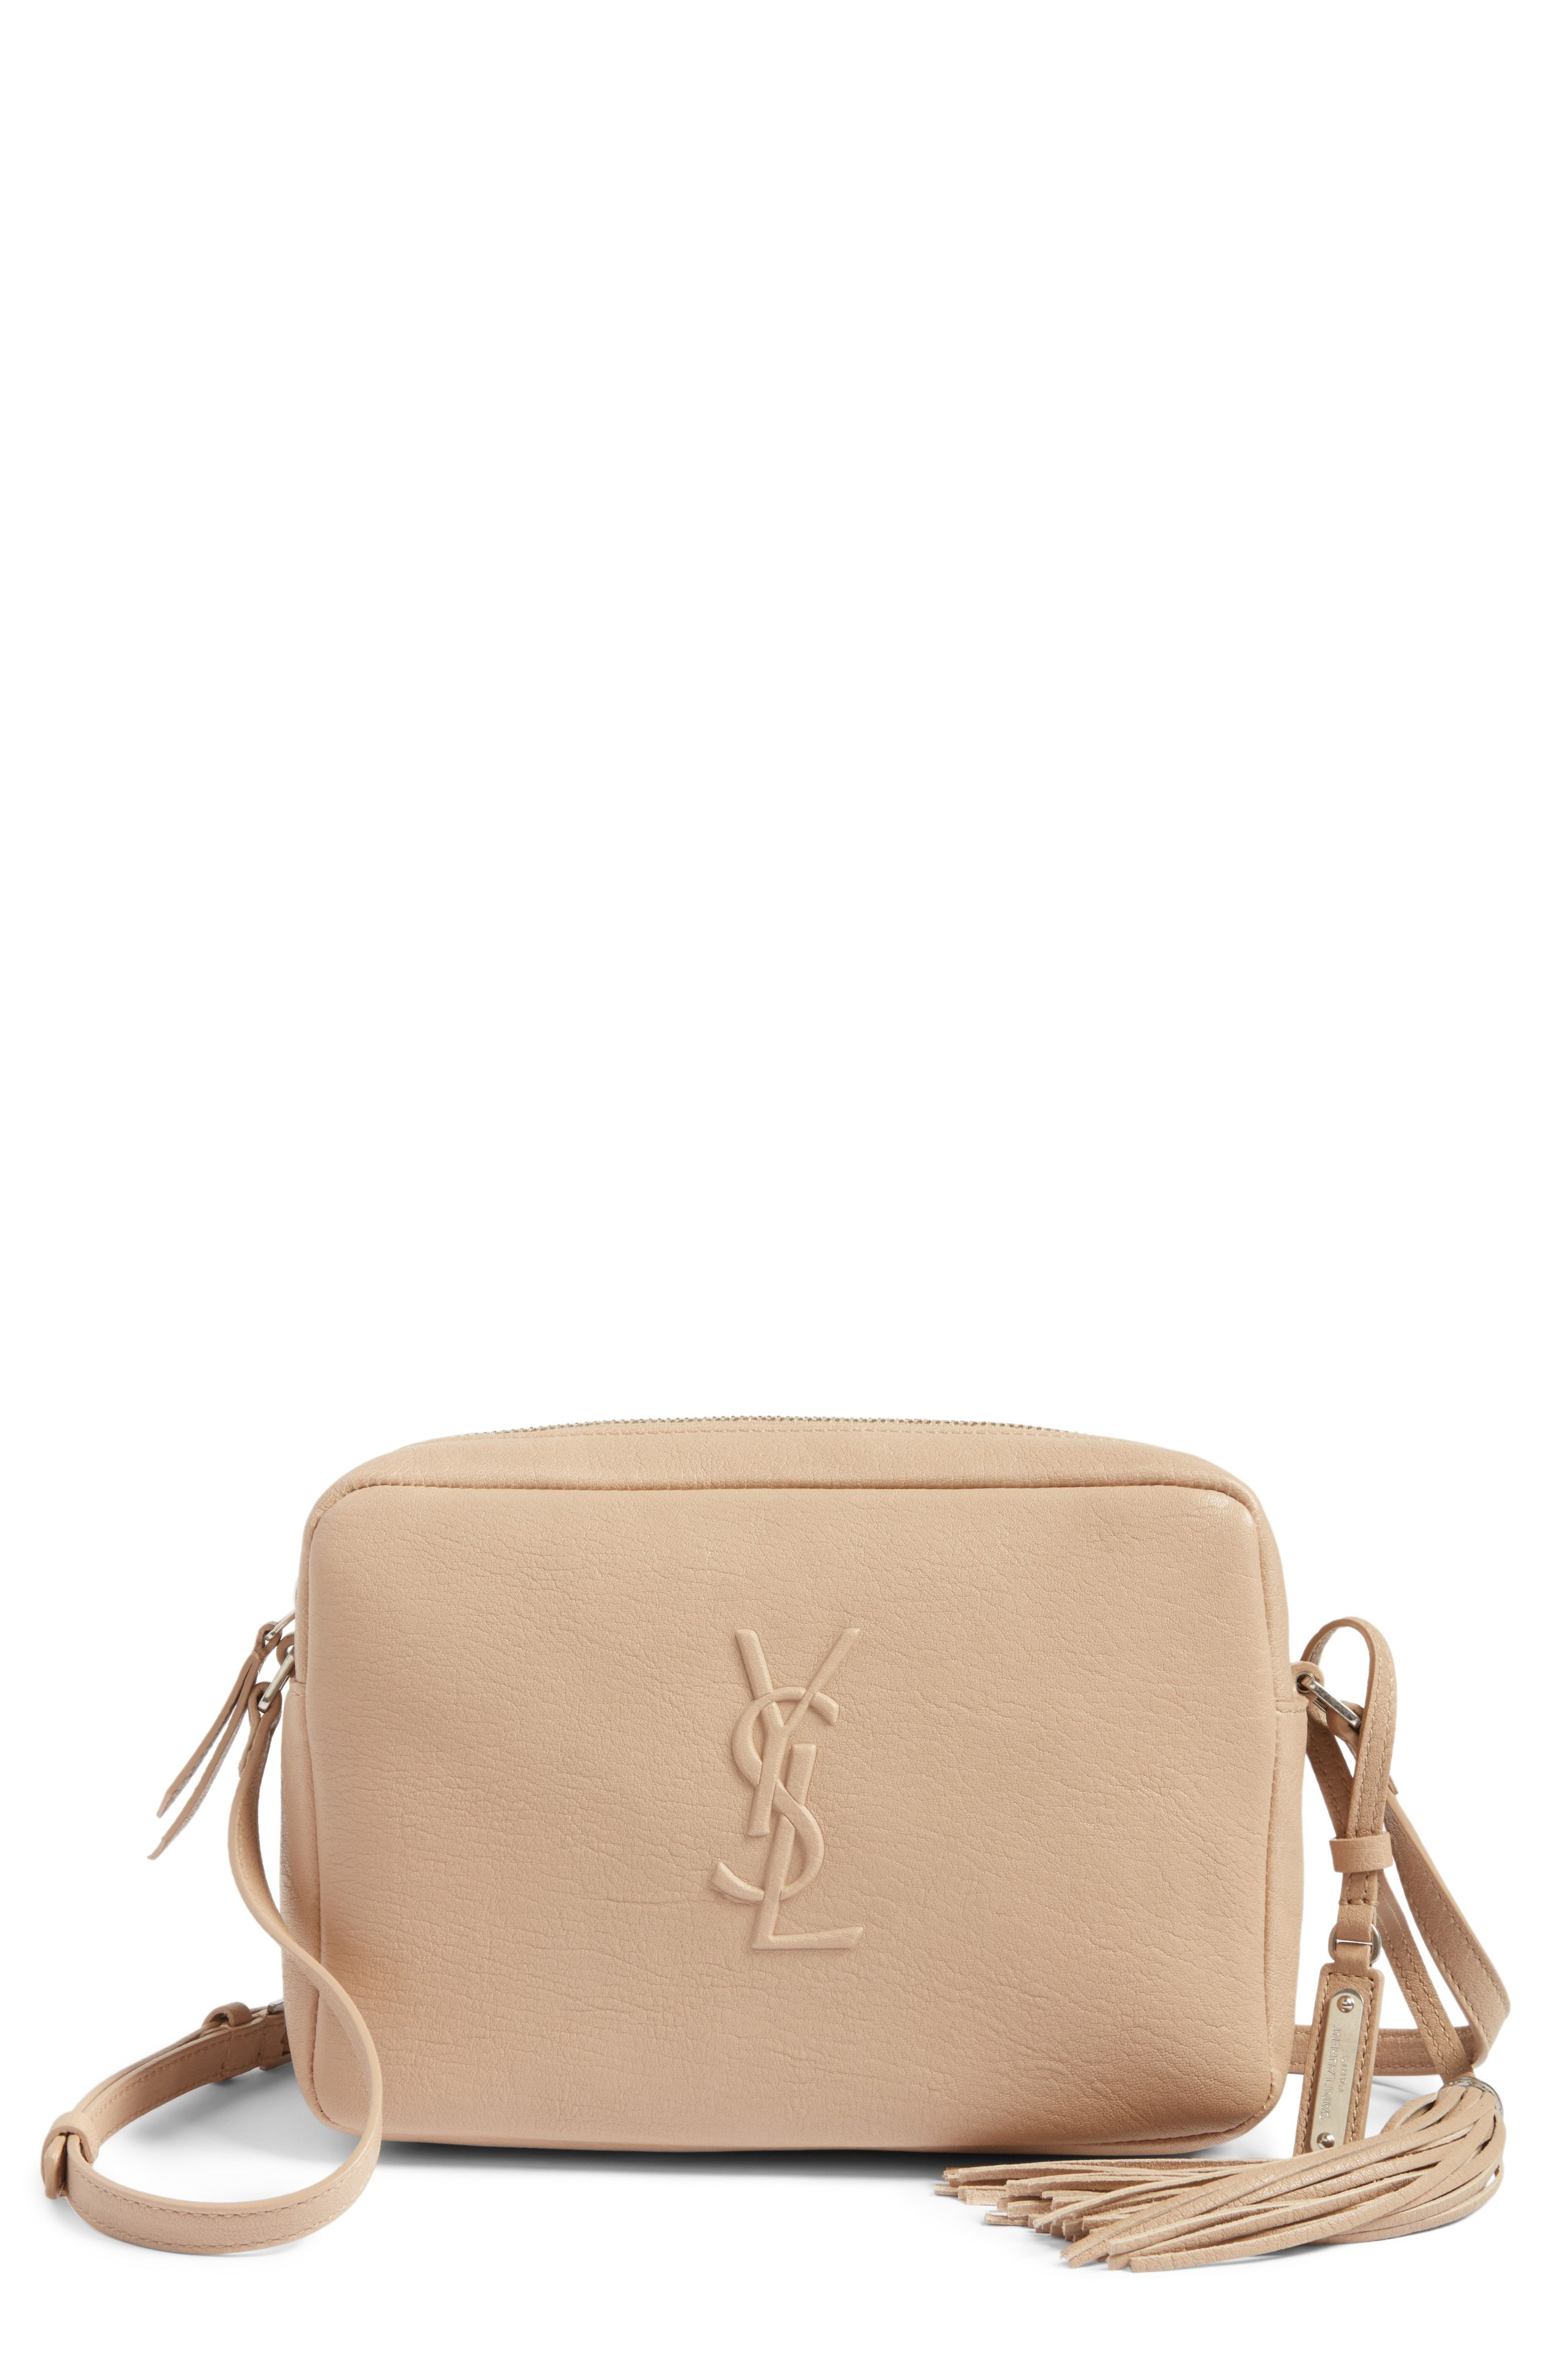 7cd787466ddb saint laurent small mono leather camera bag